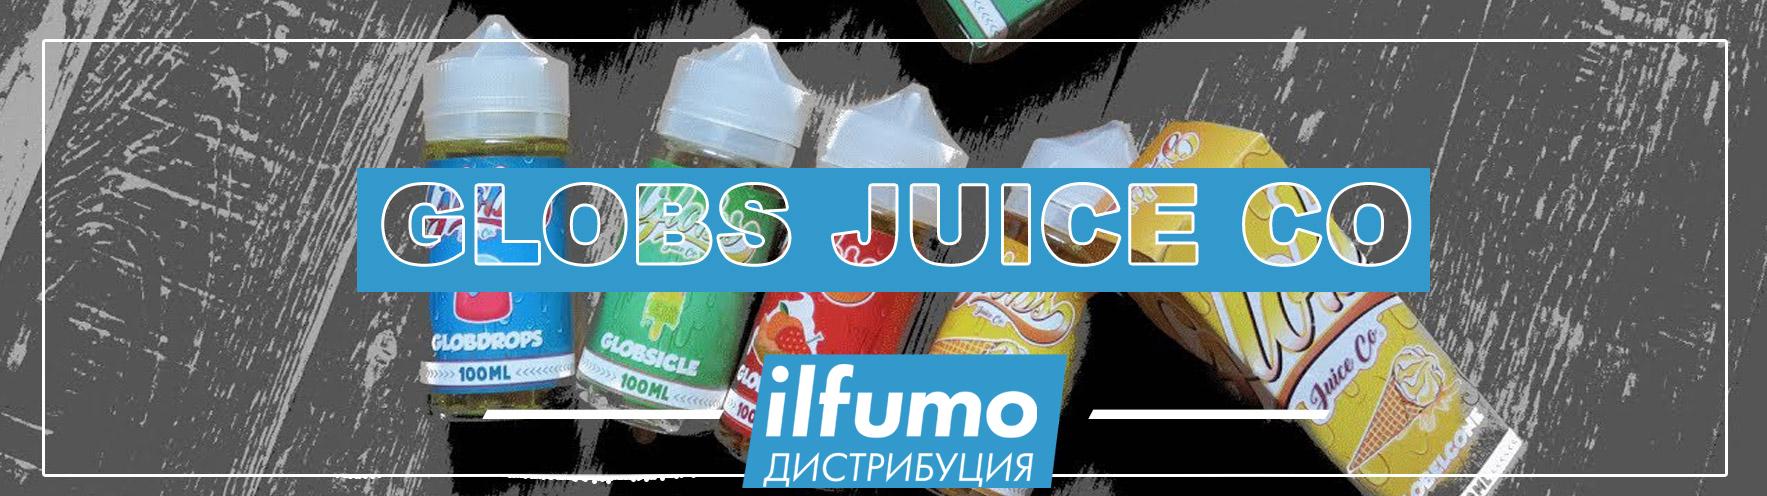 globs juice co - Жидкость Globs